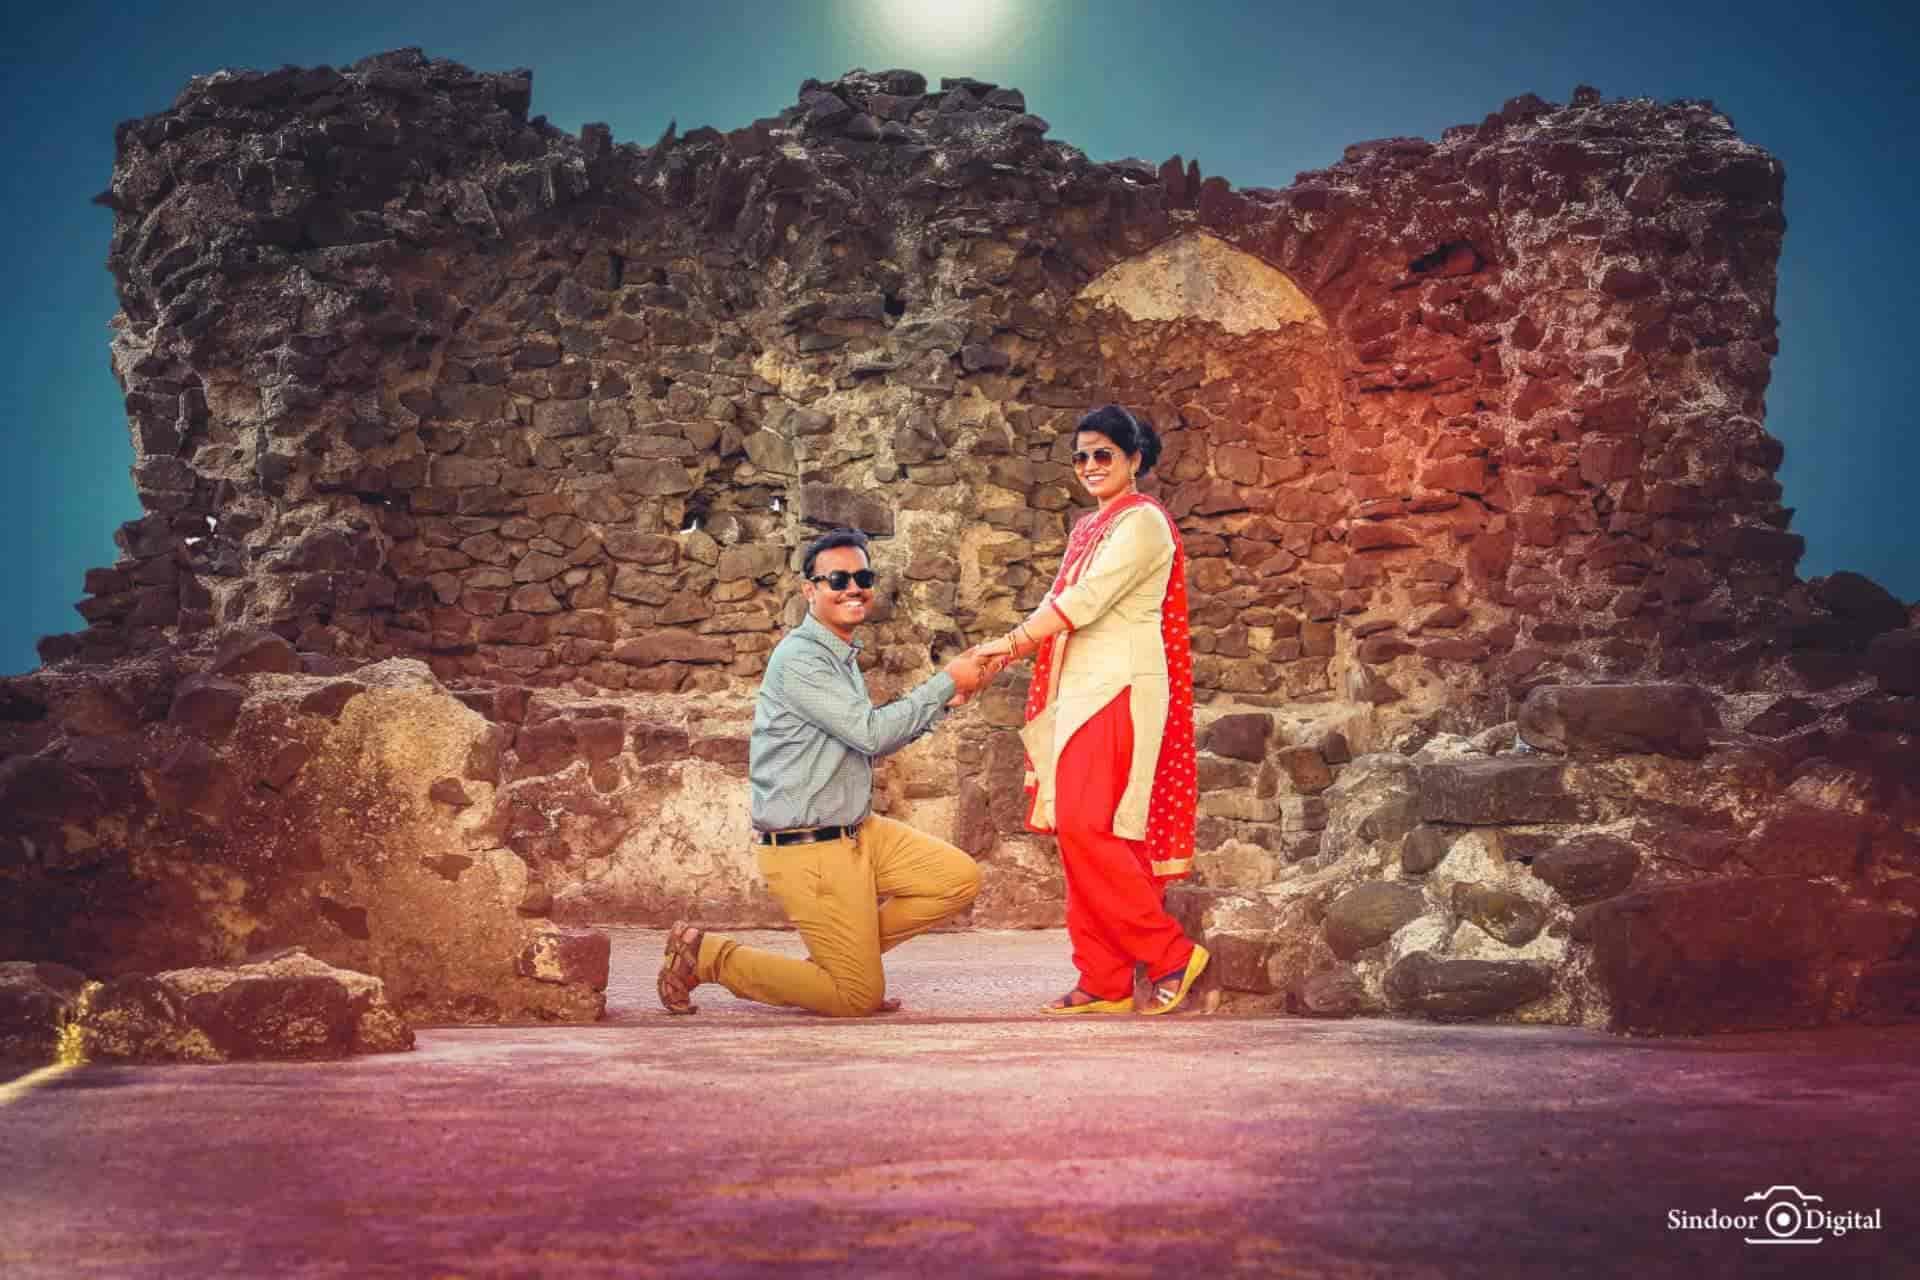 Sindoor Photo Studio, Chandabavadi Bijapur - Photo Studios in